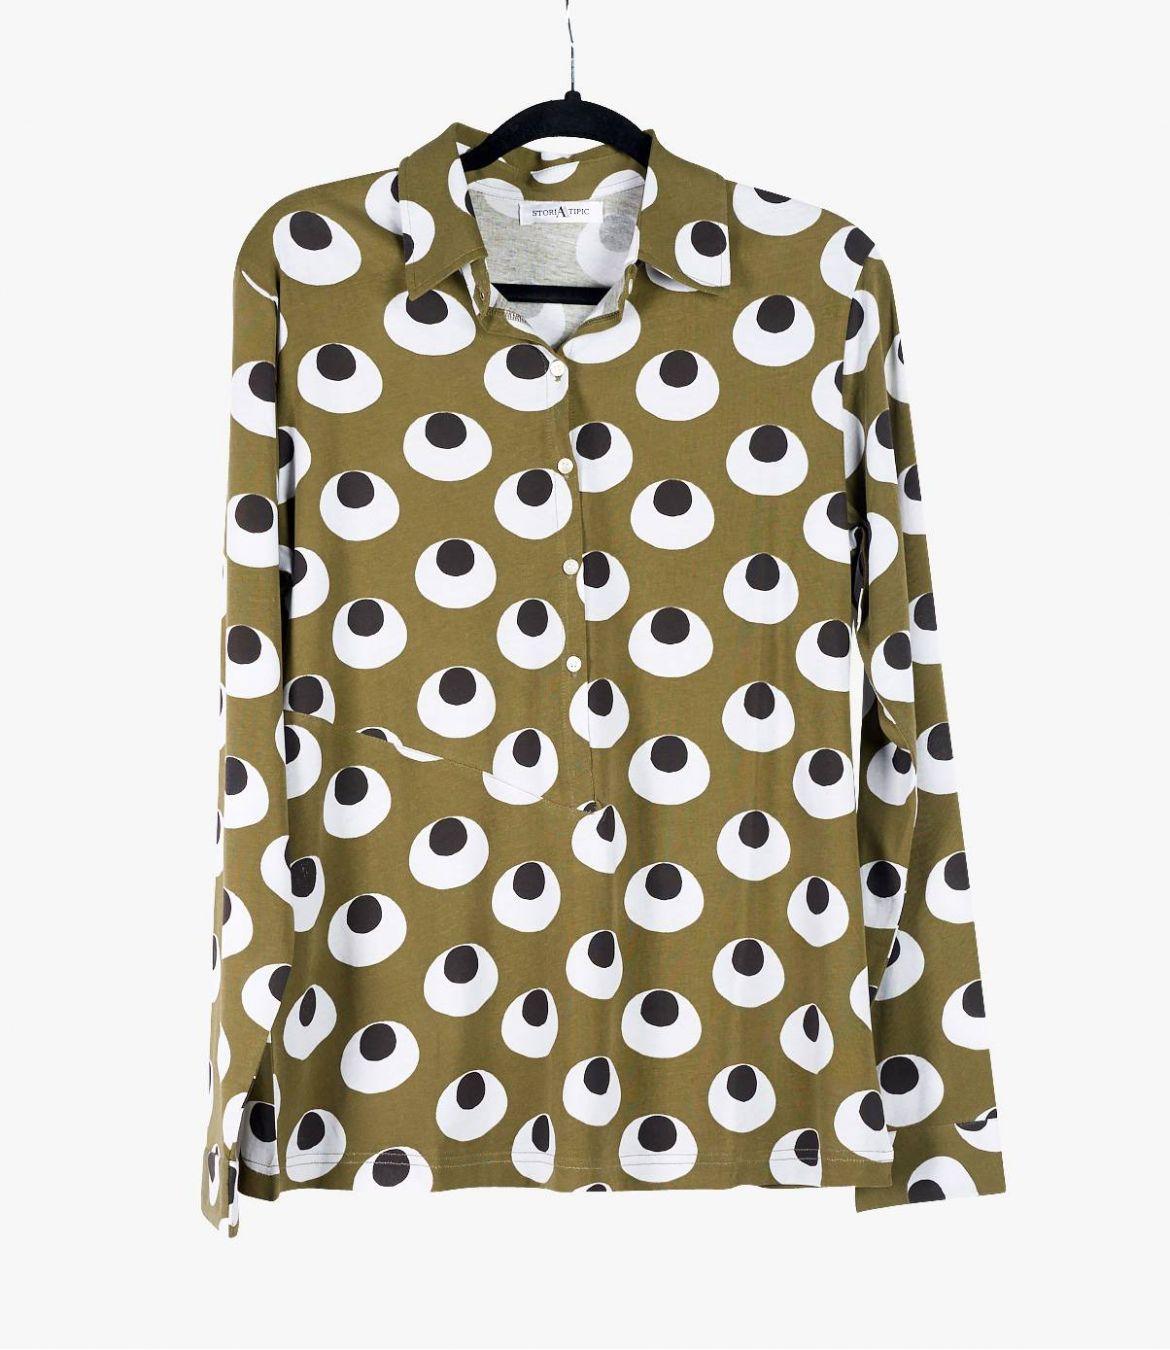 TESS DIVA Cotton Shirt for Women Storiatipic - 1